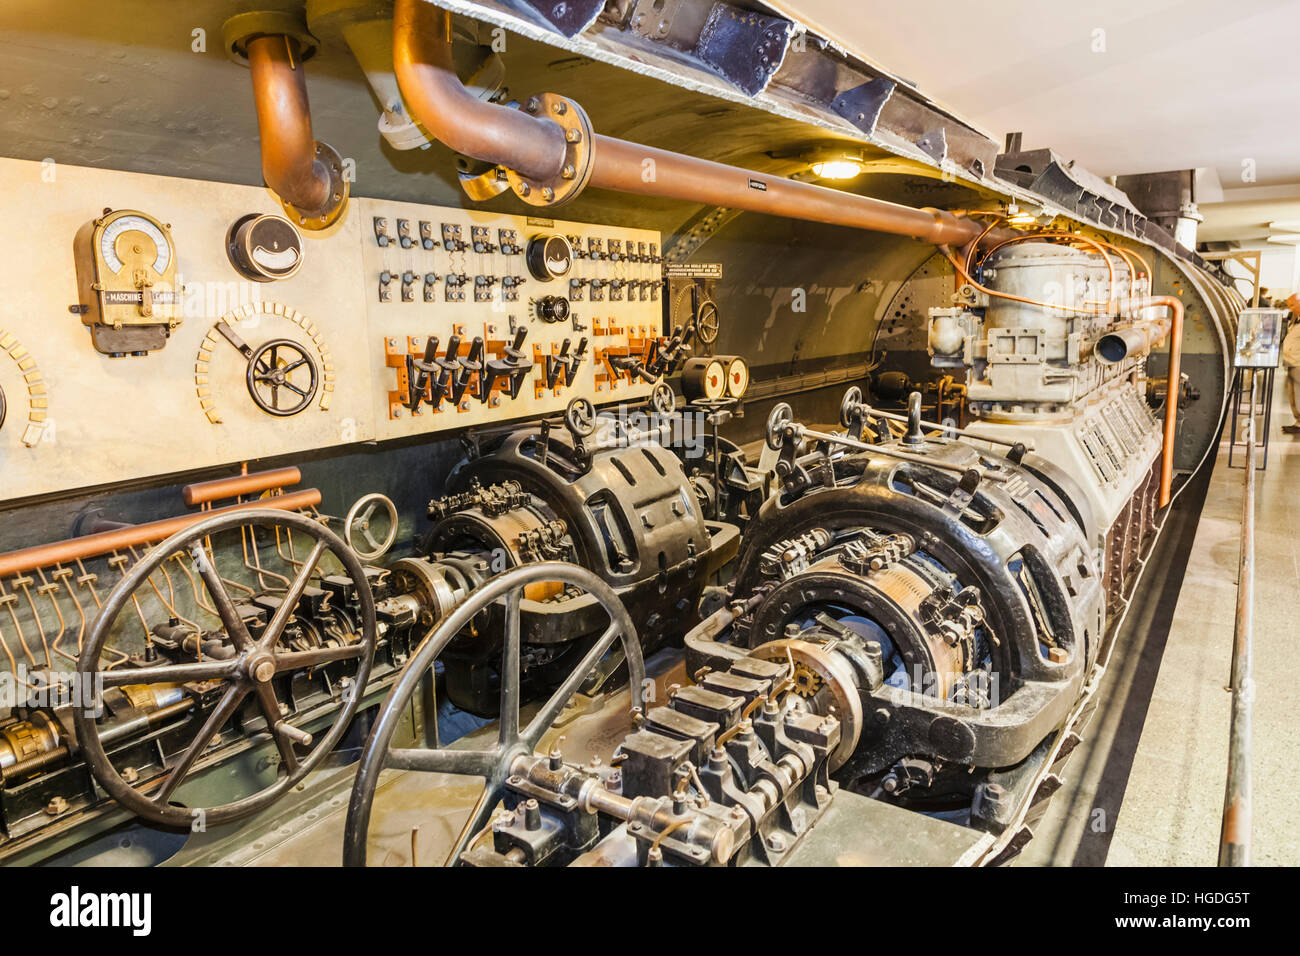 Germany, Bavaria, Munich, Deutsches Museum, Exhibit of WWII U-boat - Stock Image